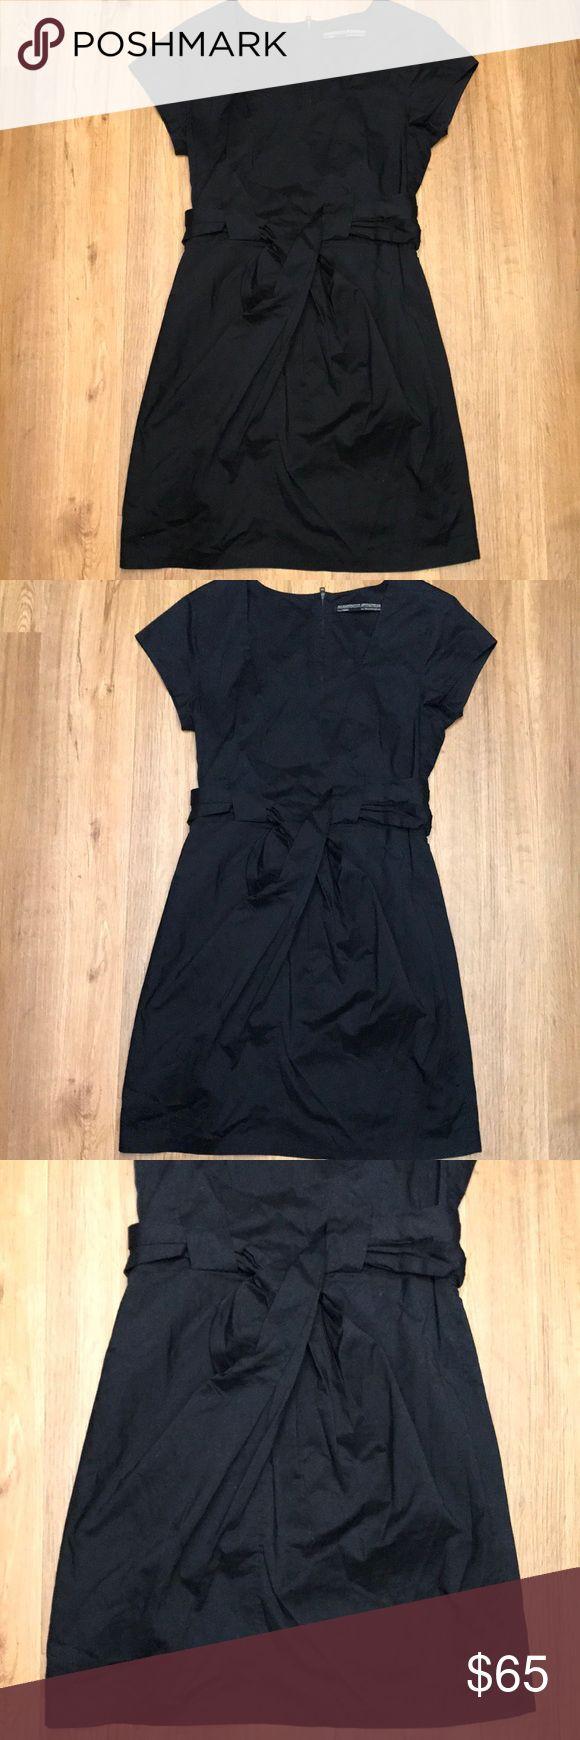 ALLSAINTS Spitalfields black dress size 8 ALLSAINTS dress in excellent condition Allsaints Dresses Asymmetrical